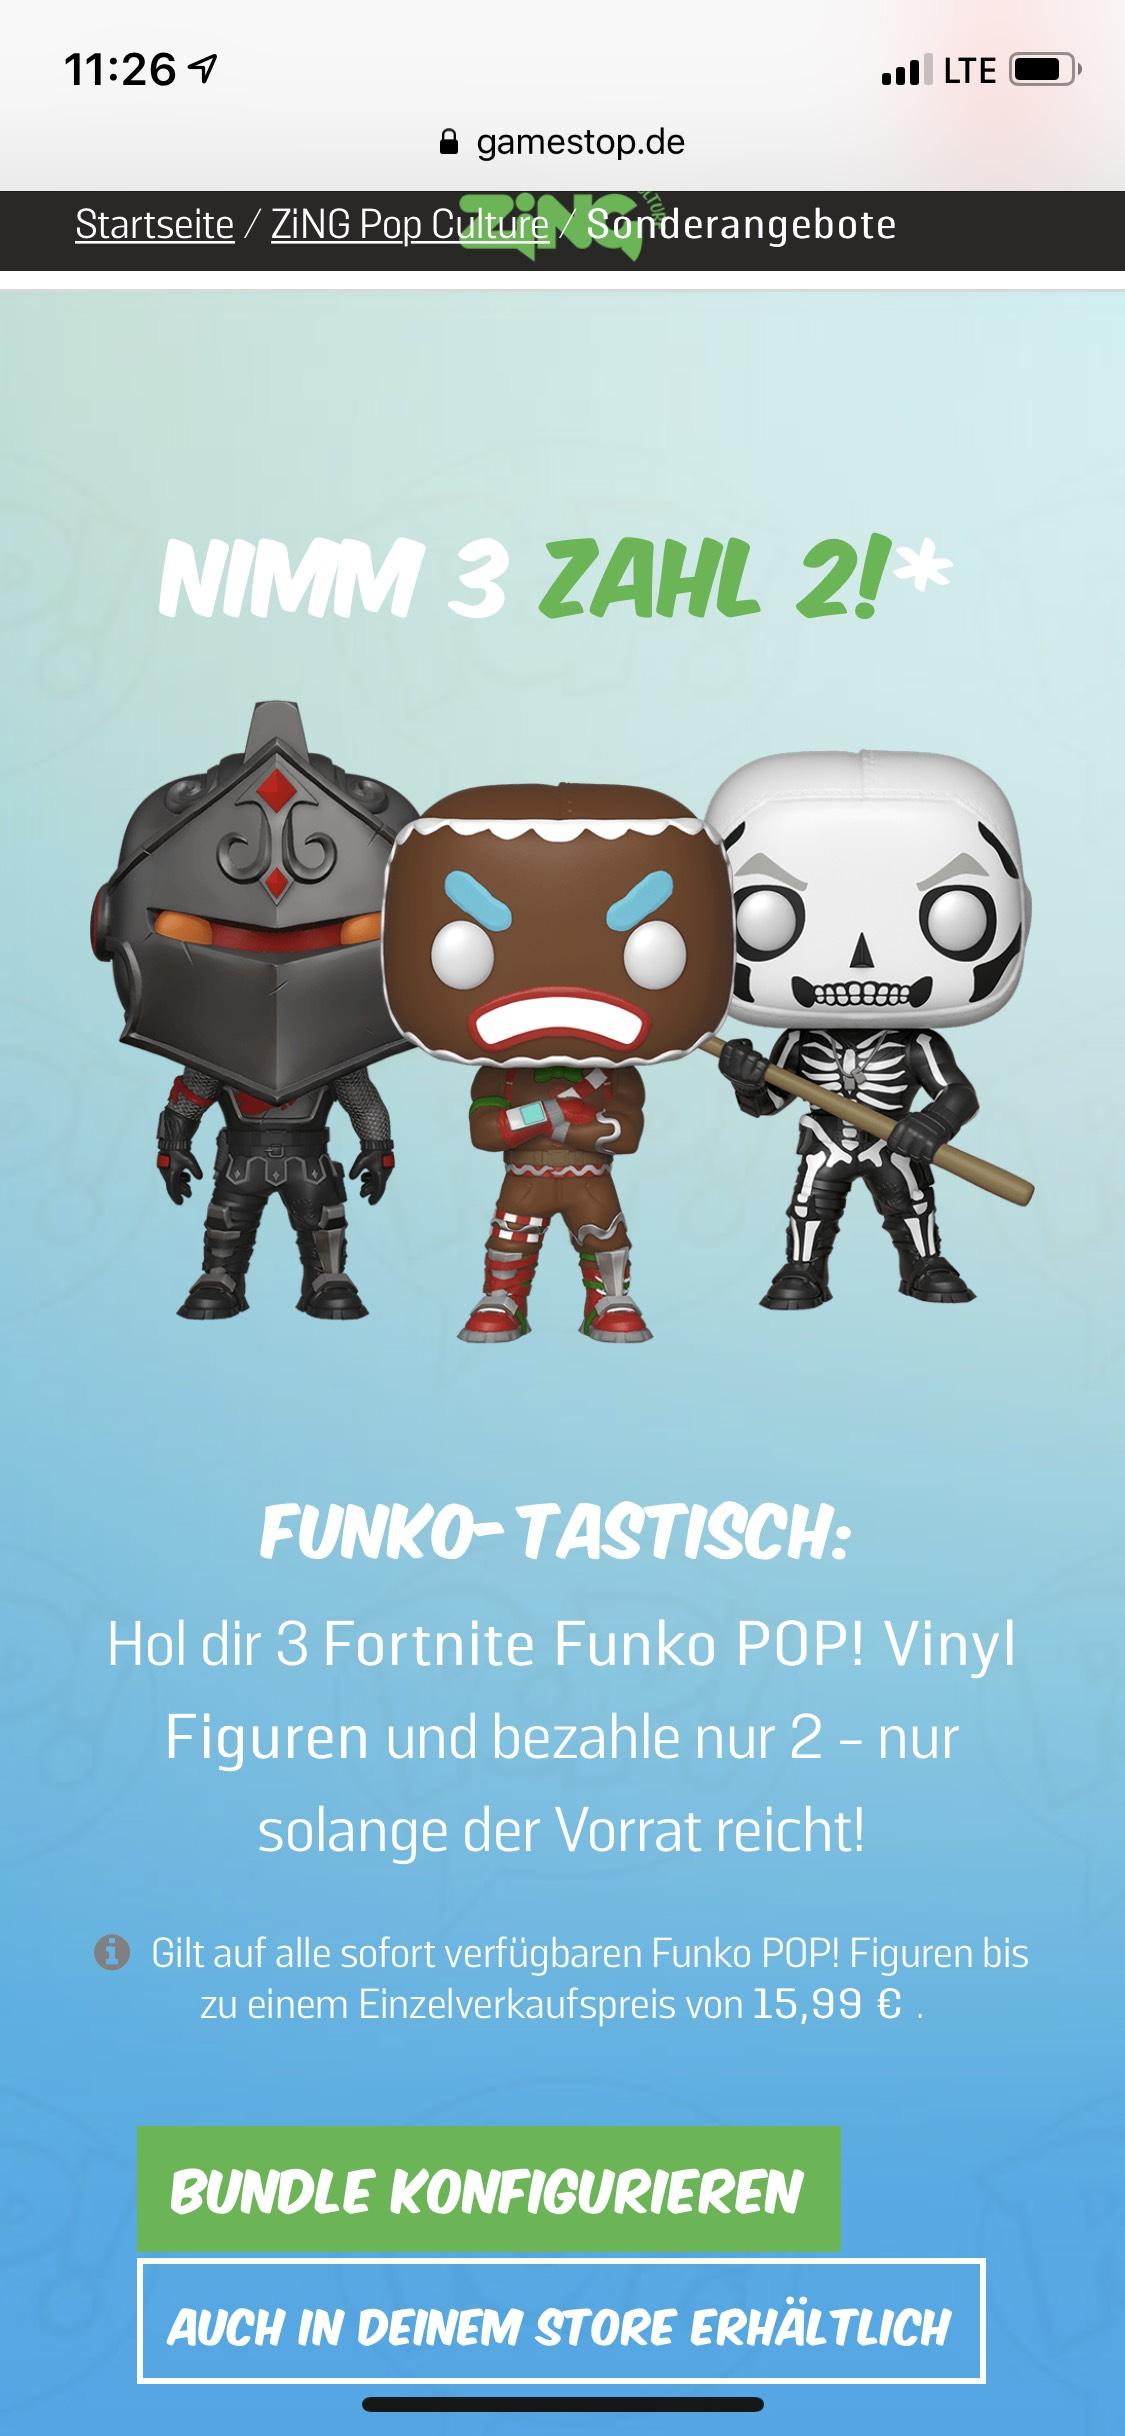 Fortnite Funko Pop Nimm 3 Zahl 2 Gamestop Mydealz De